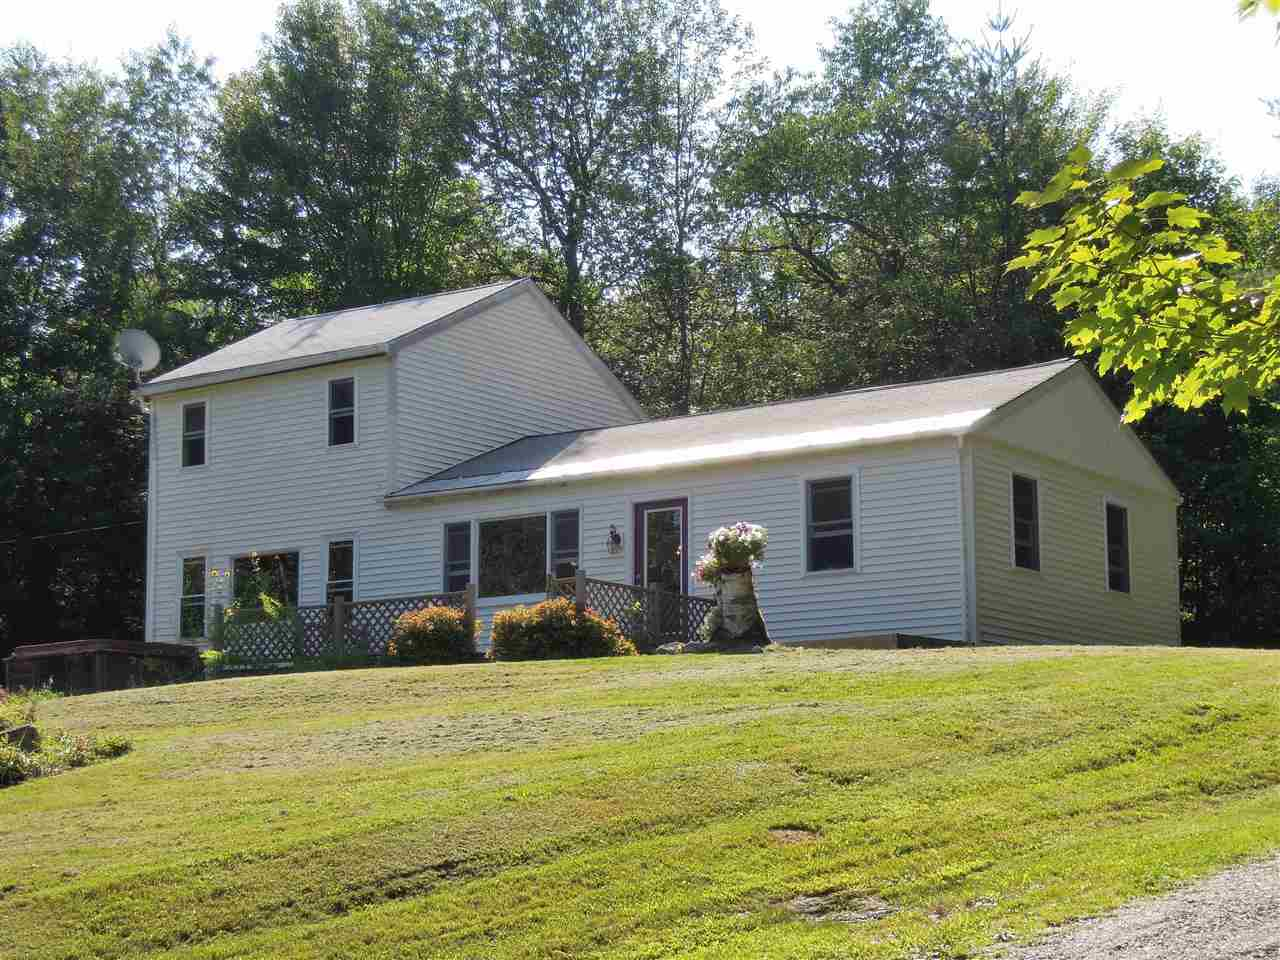 32 Pasture Lane, Wilmington, VT 05363